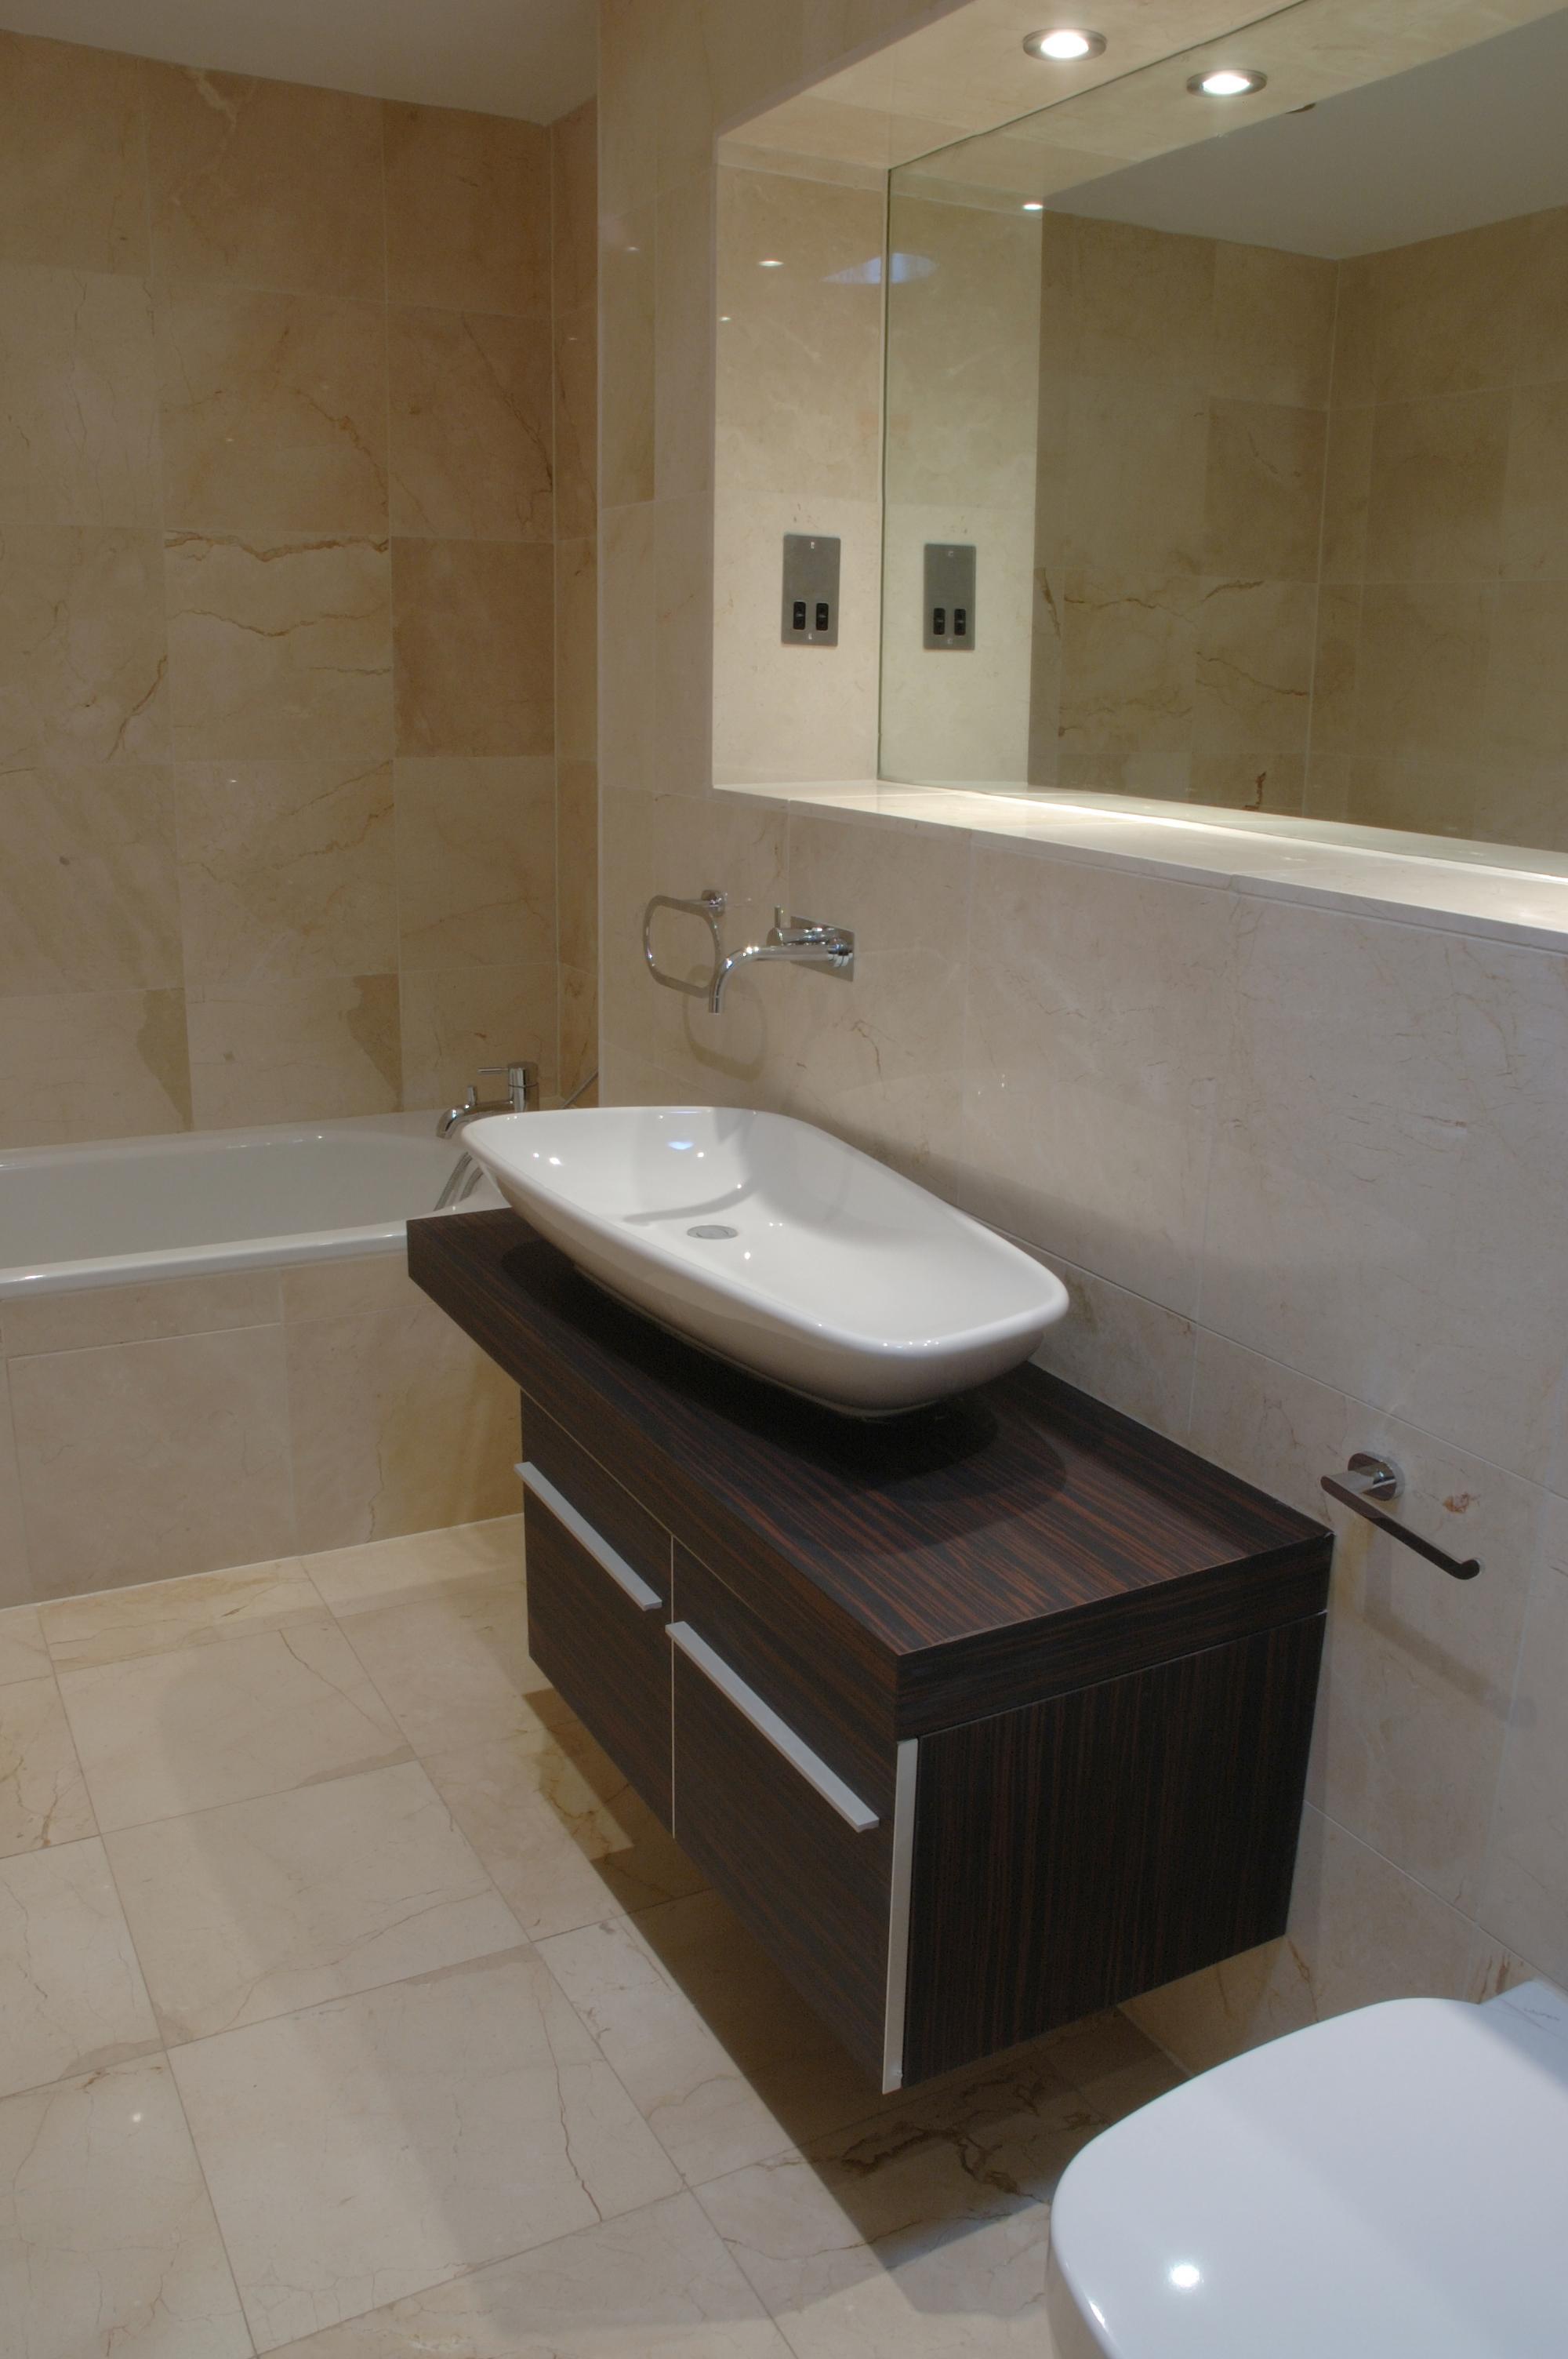 Amulree - Typical Bathroom